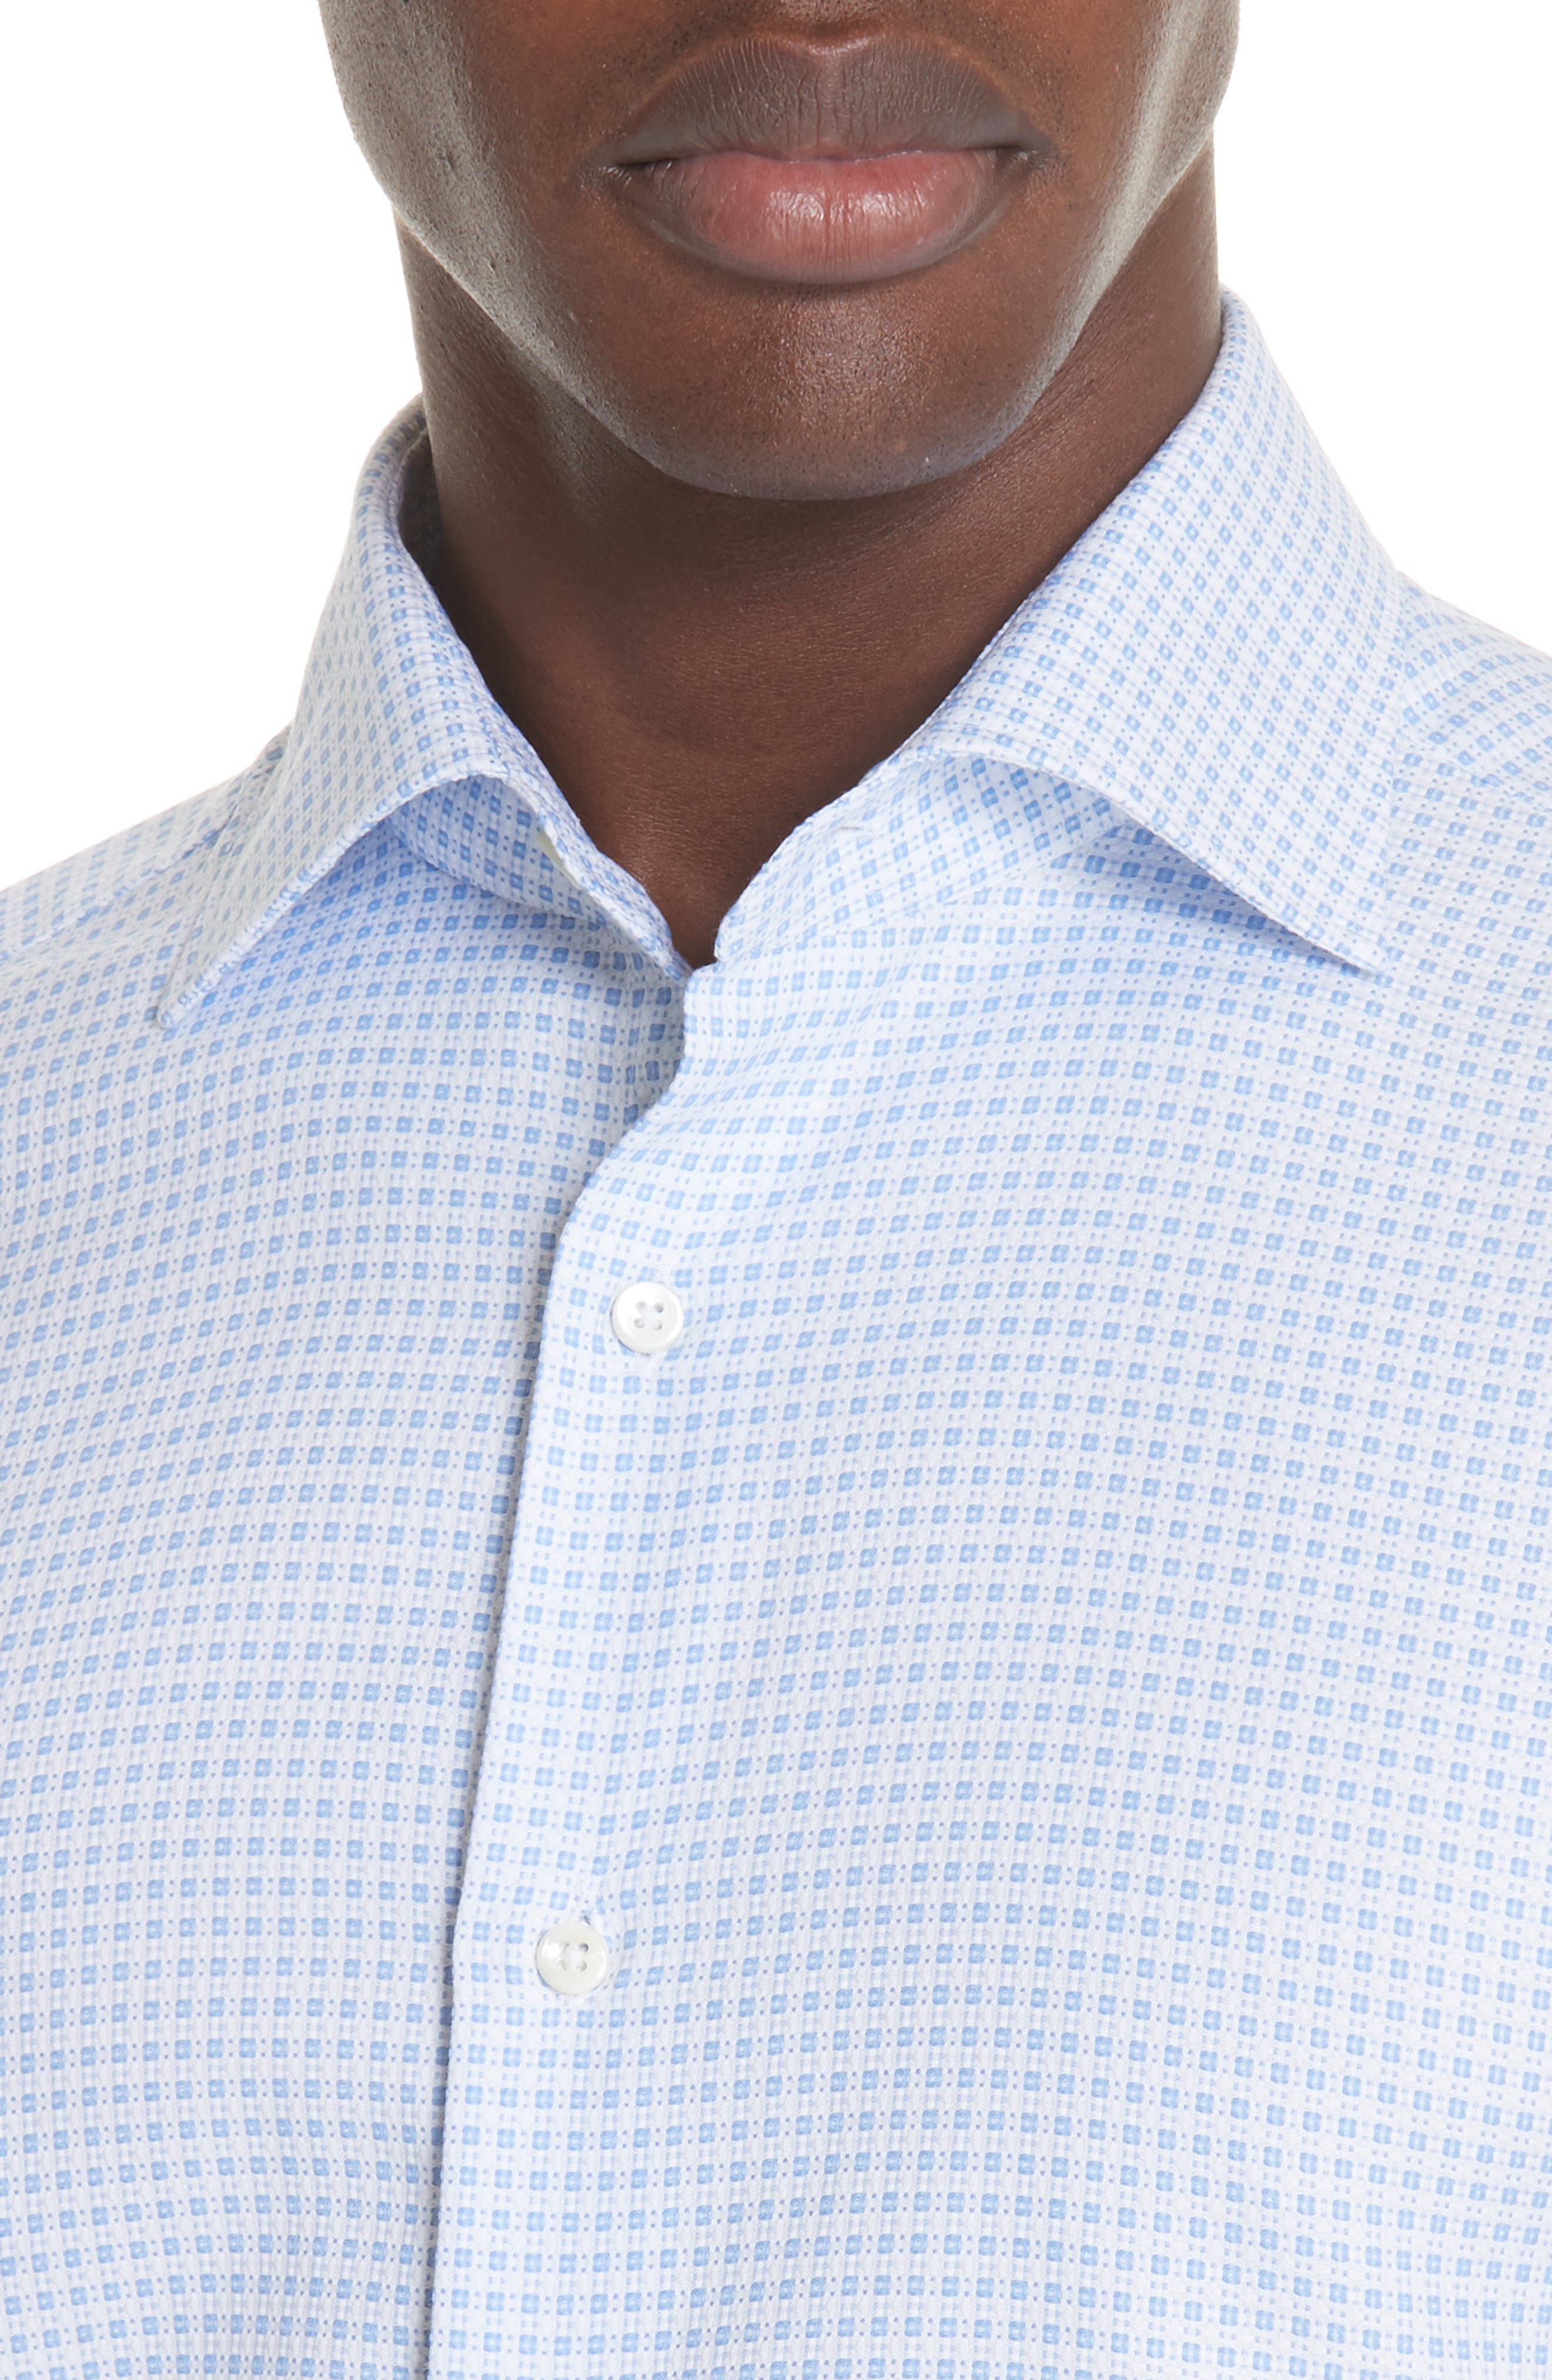 Regular Fit Check Dress Shirt,                             Alternate thumbnail 2, color,                             Bright Blue